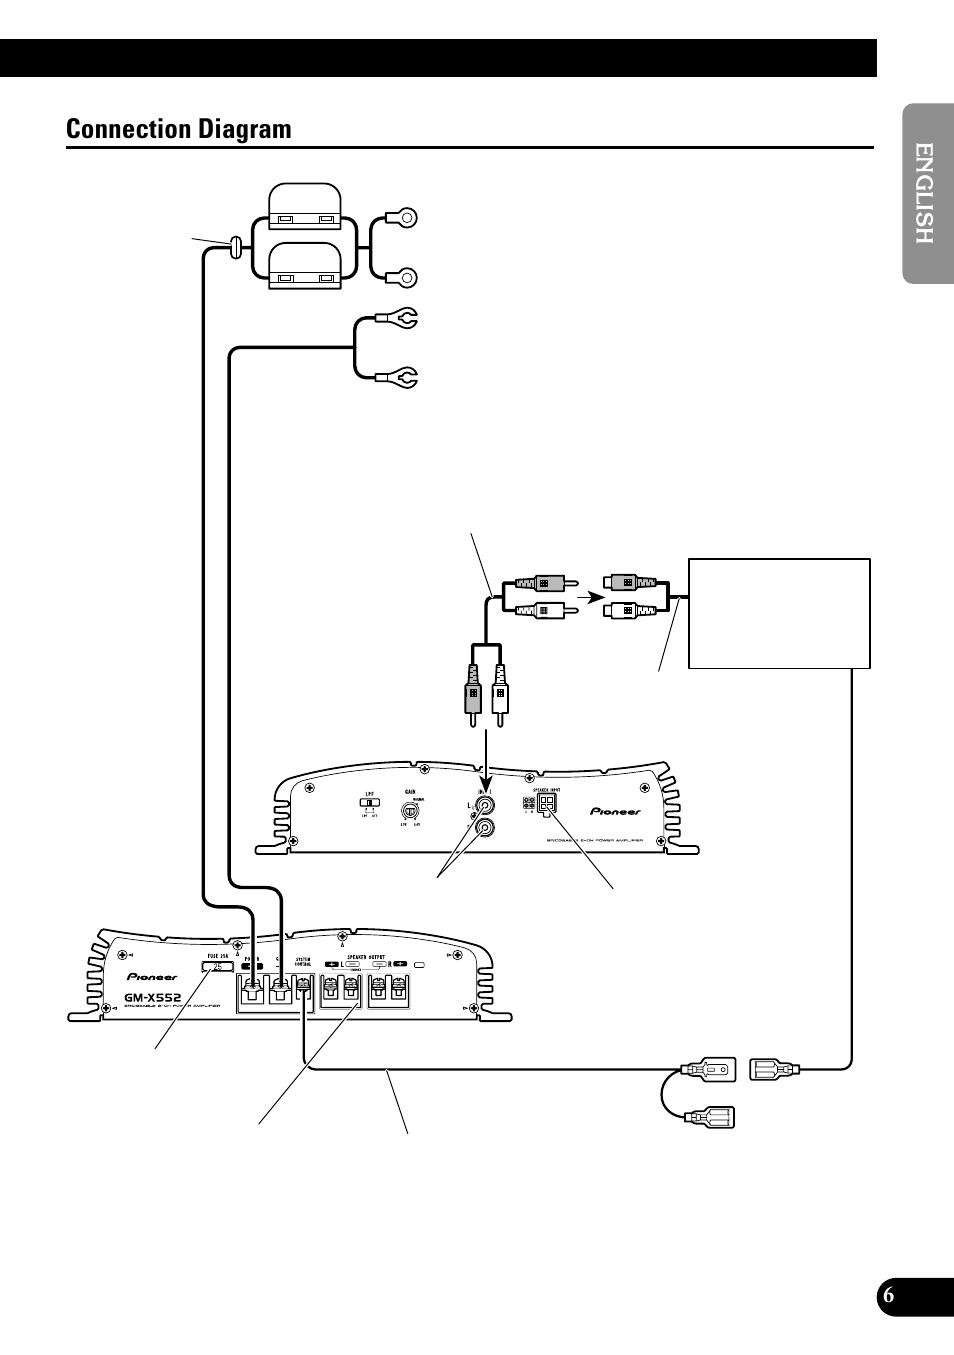 medium resolution of wiring diagram for auto antenna